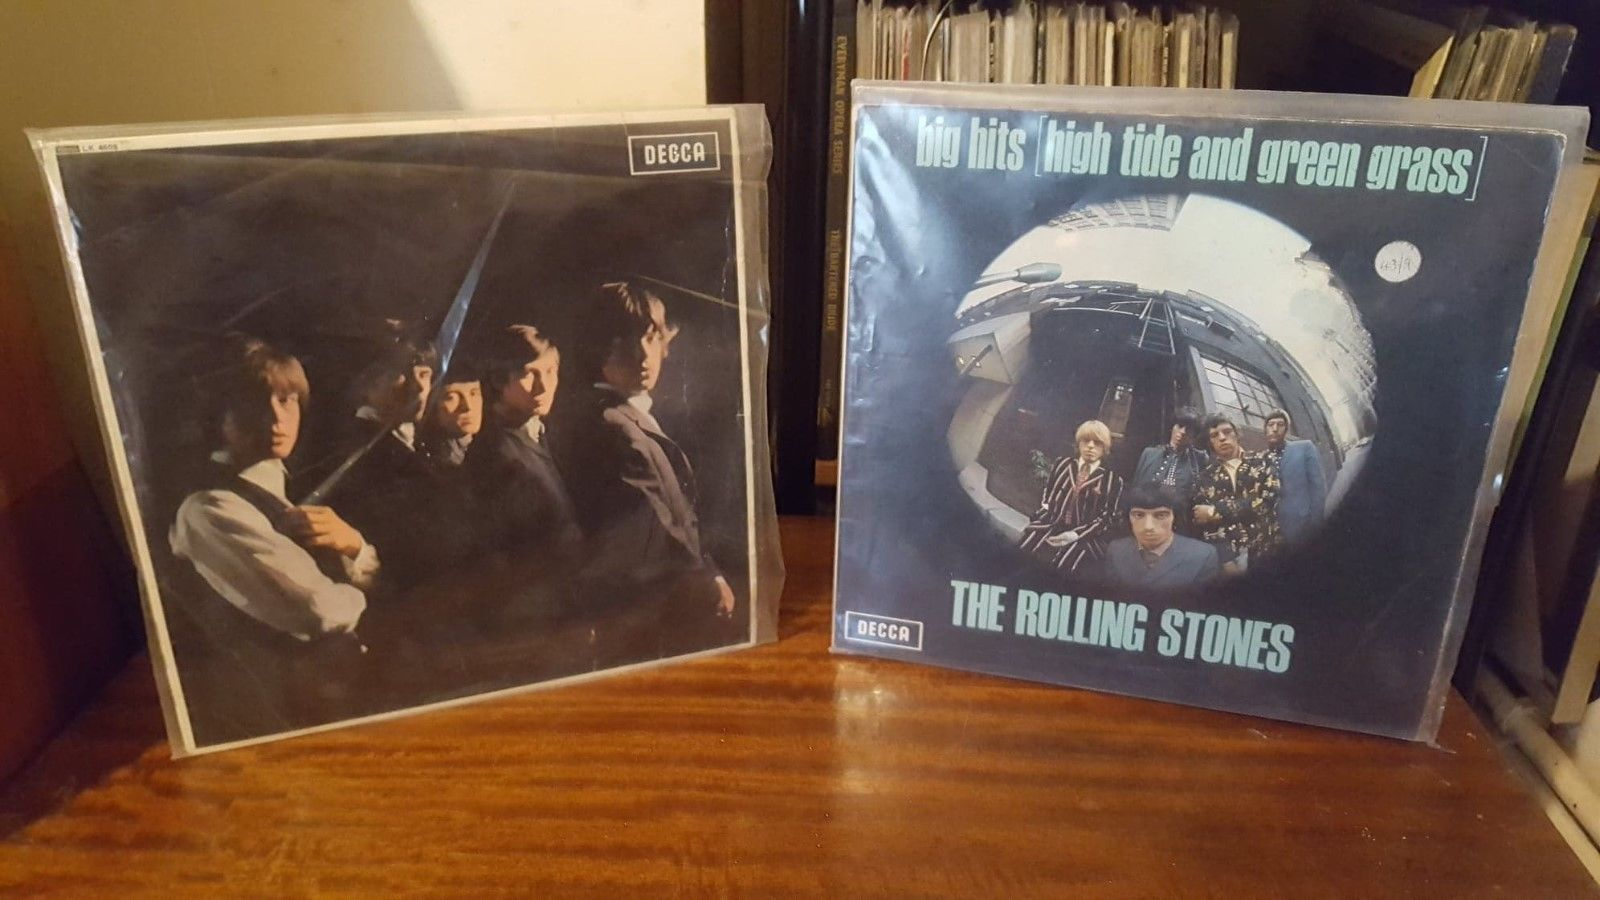 The Rolling Stones Orig Uk 1st Pressings Vinyl Lp's Decca TXS 101 / LK 405 Rare